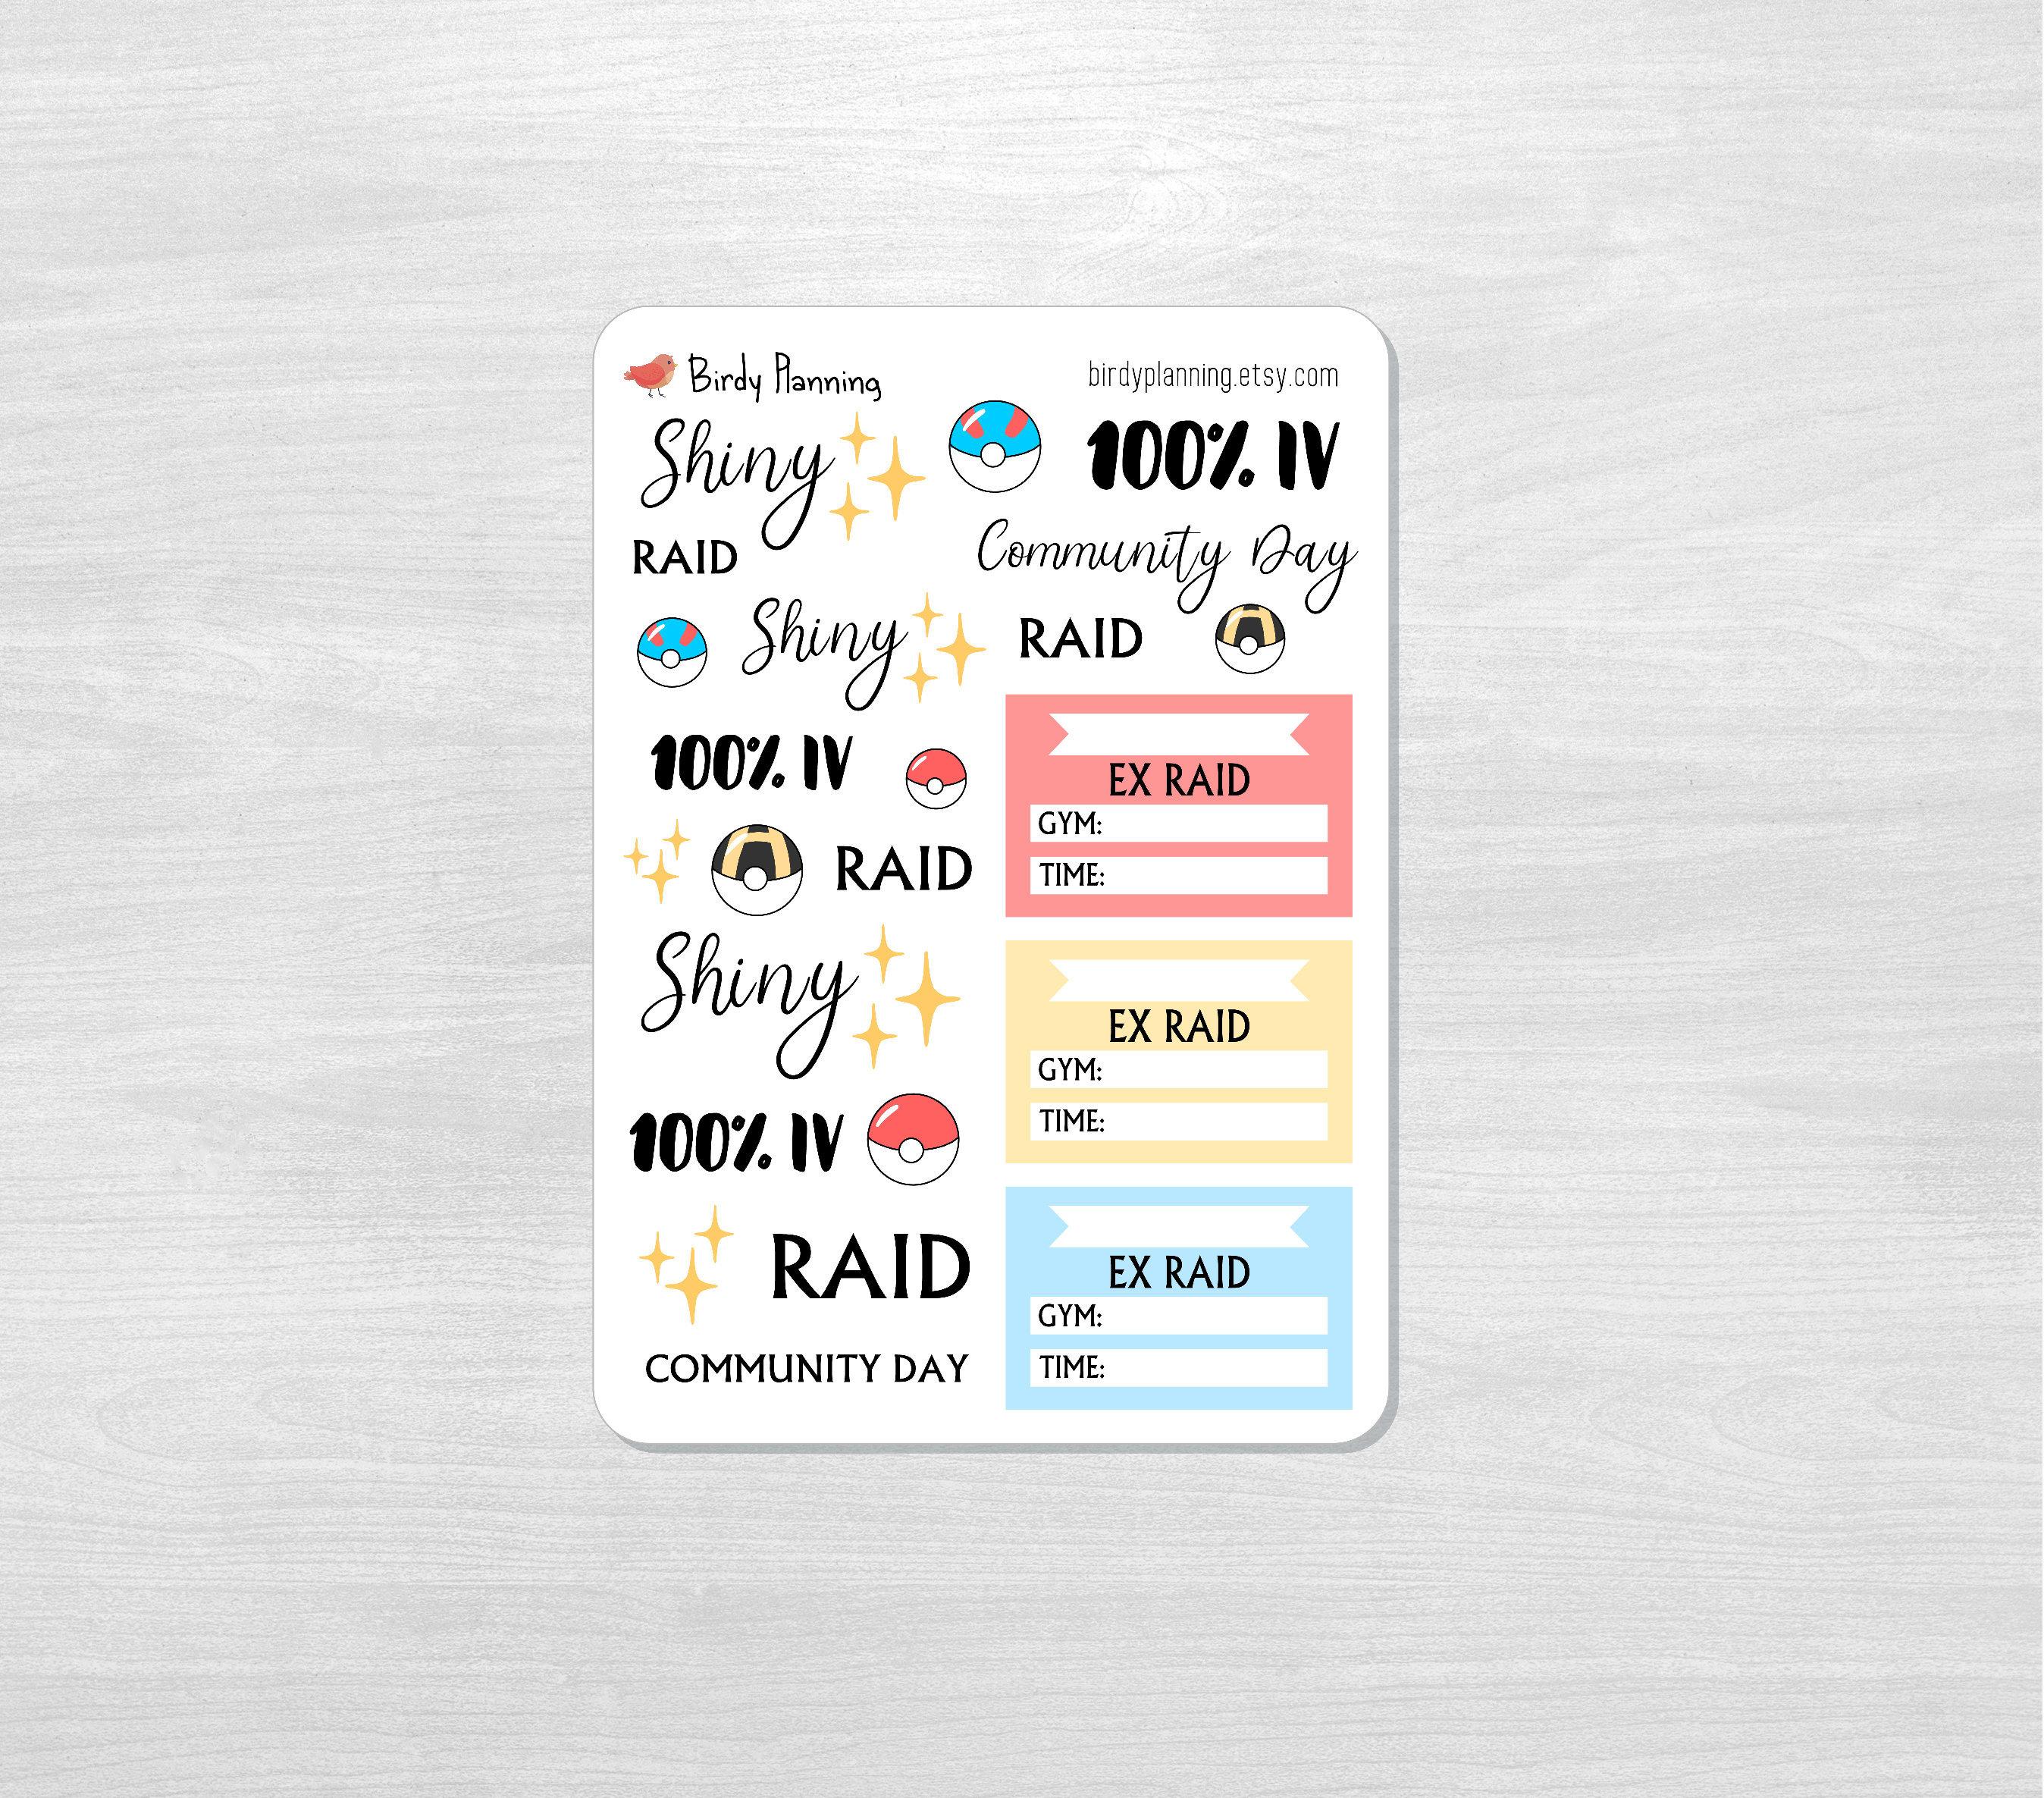 Pokemon Go Stickers - Raid, Shiny, 100% IV, Community Day, EX Raid - Birdy  Planning